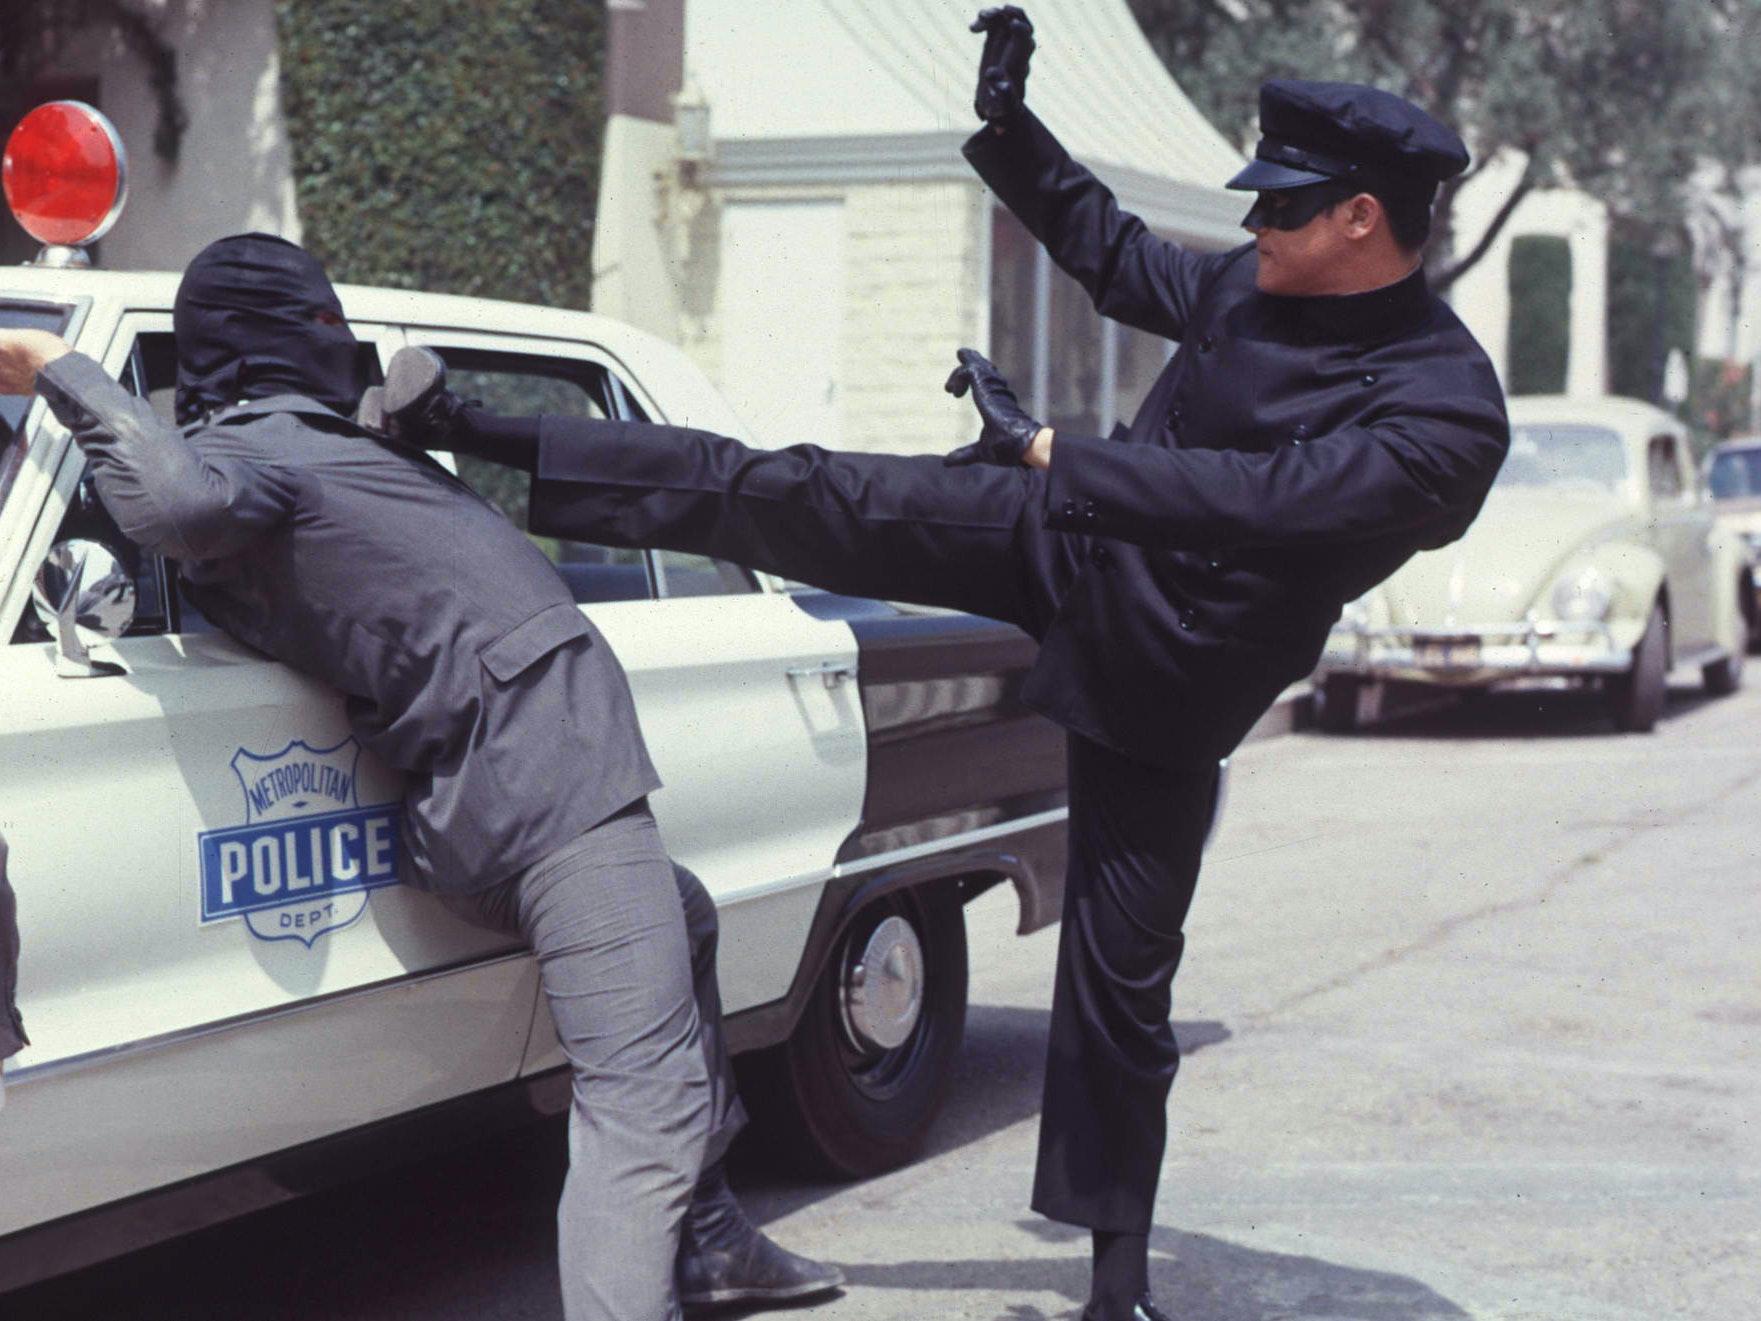 50 Years Later, Bruce Lee Still Makes 'The Green Hornet' Kick Ass